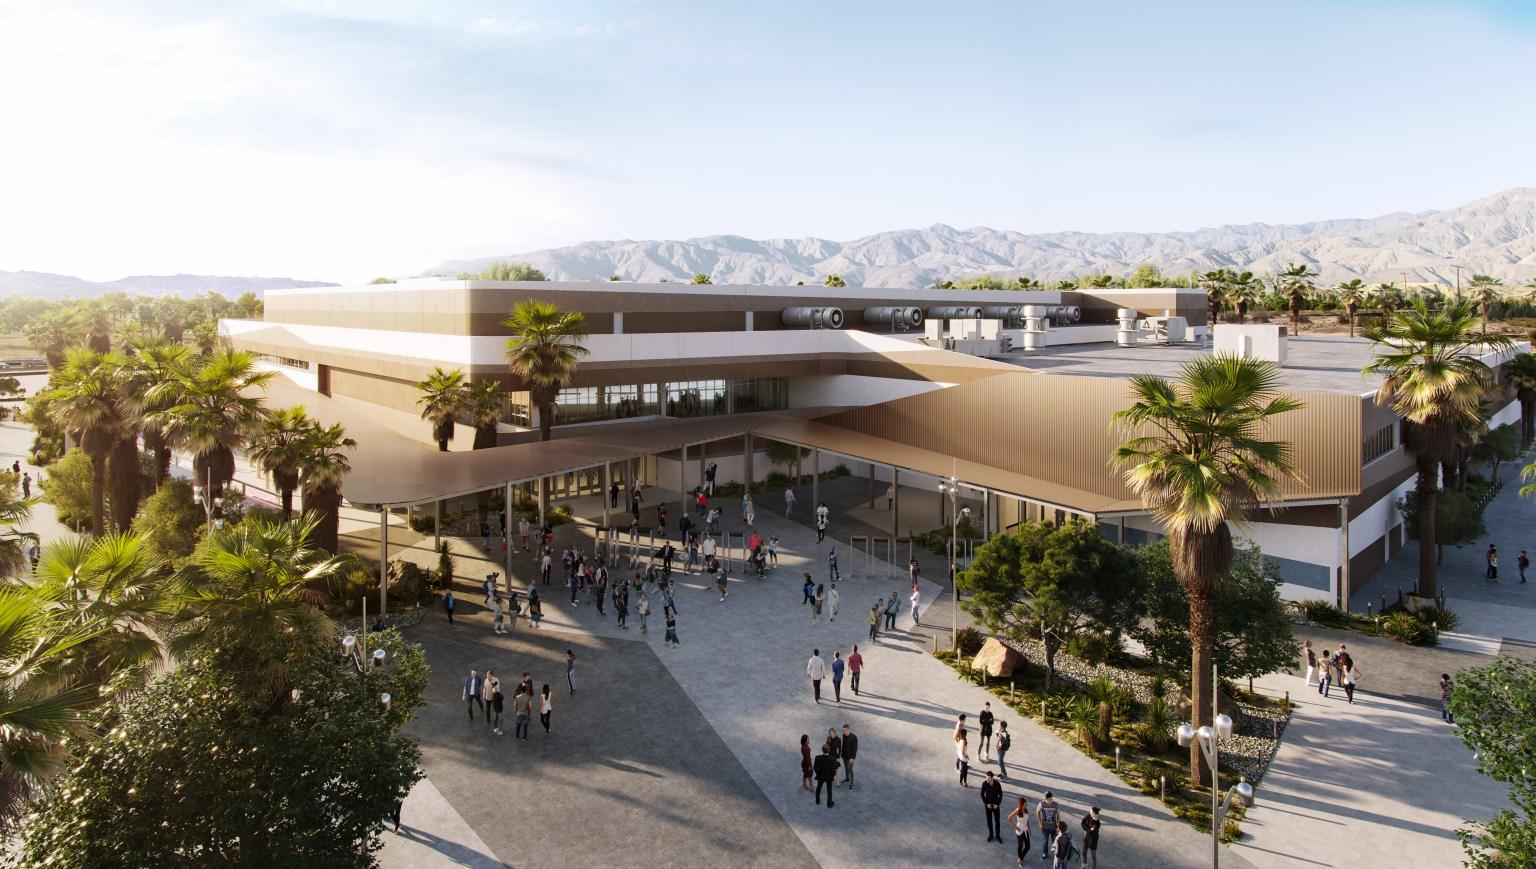 Coachella Valley Arena breaks ground Wednesday afternoon